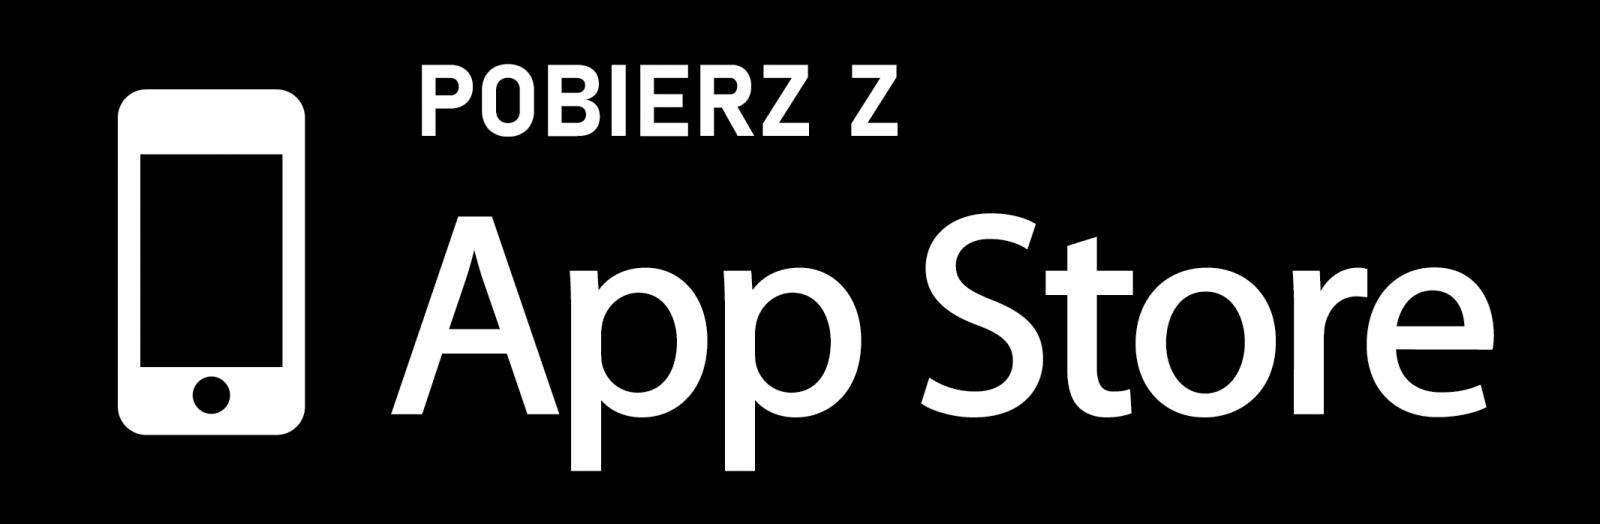 Przycisk App Store